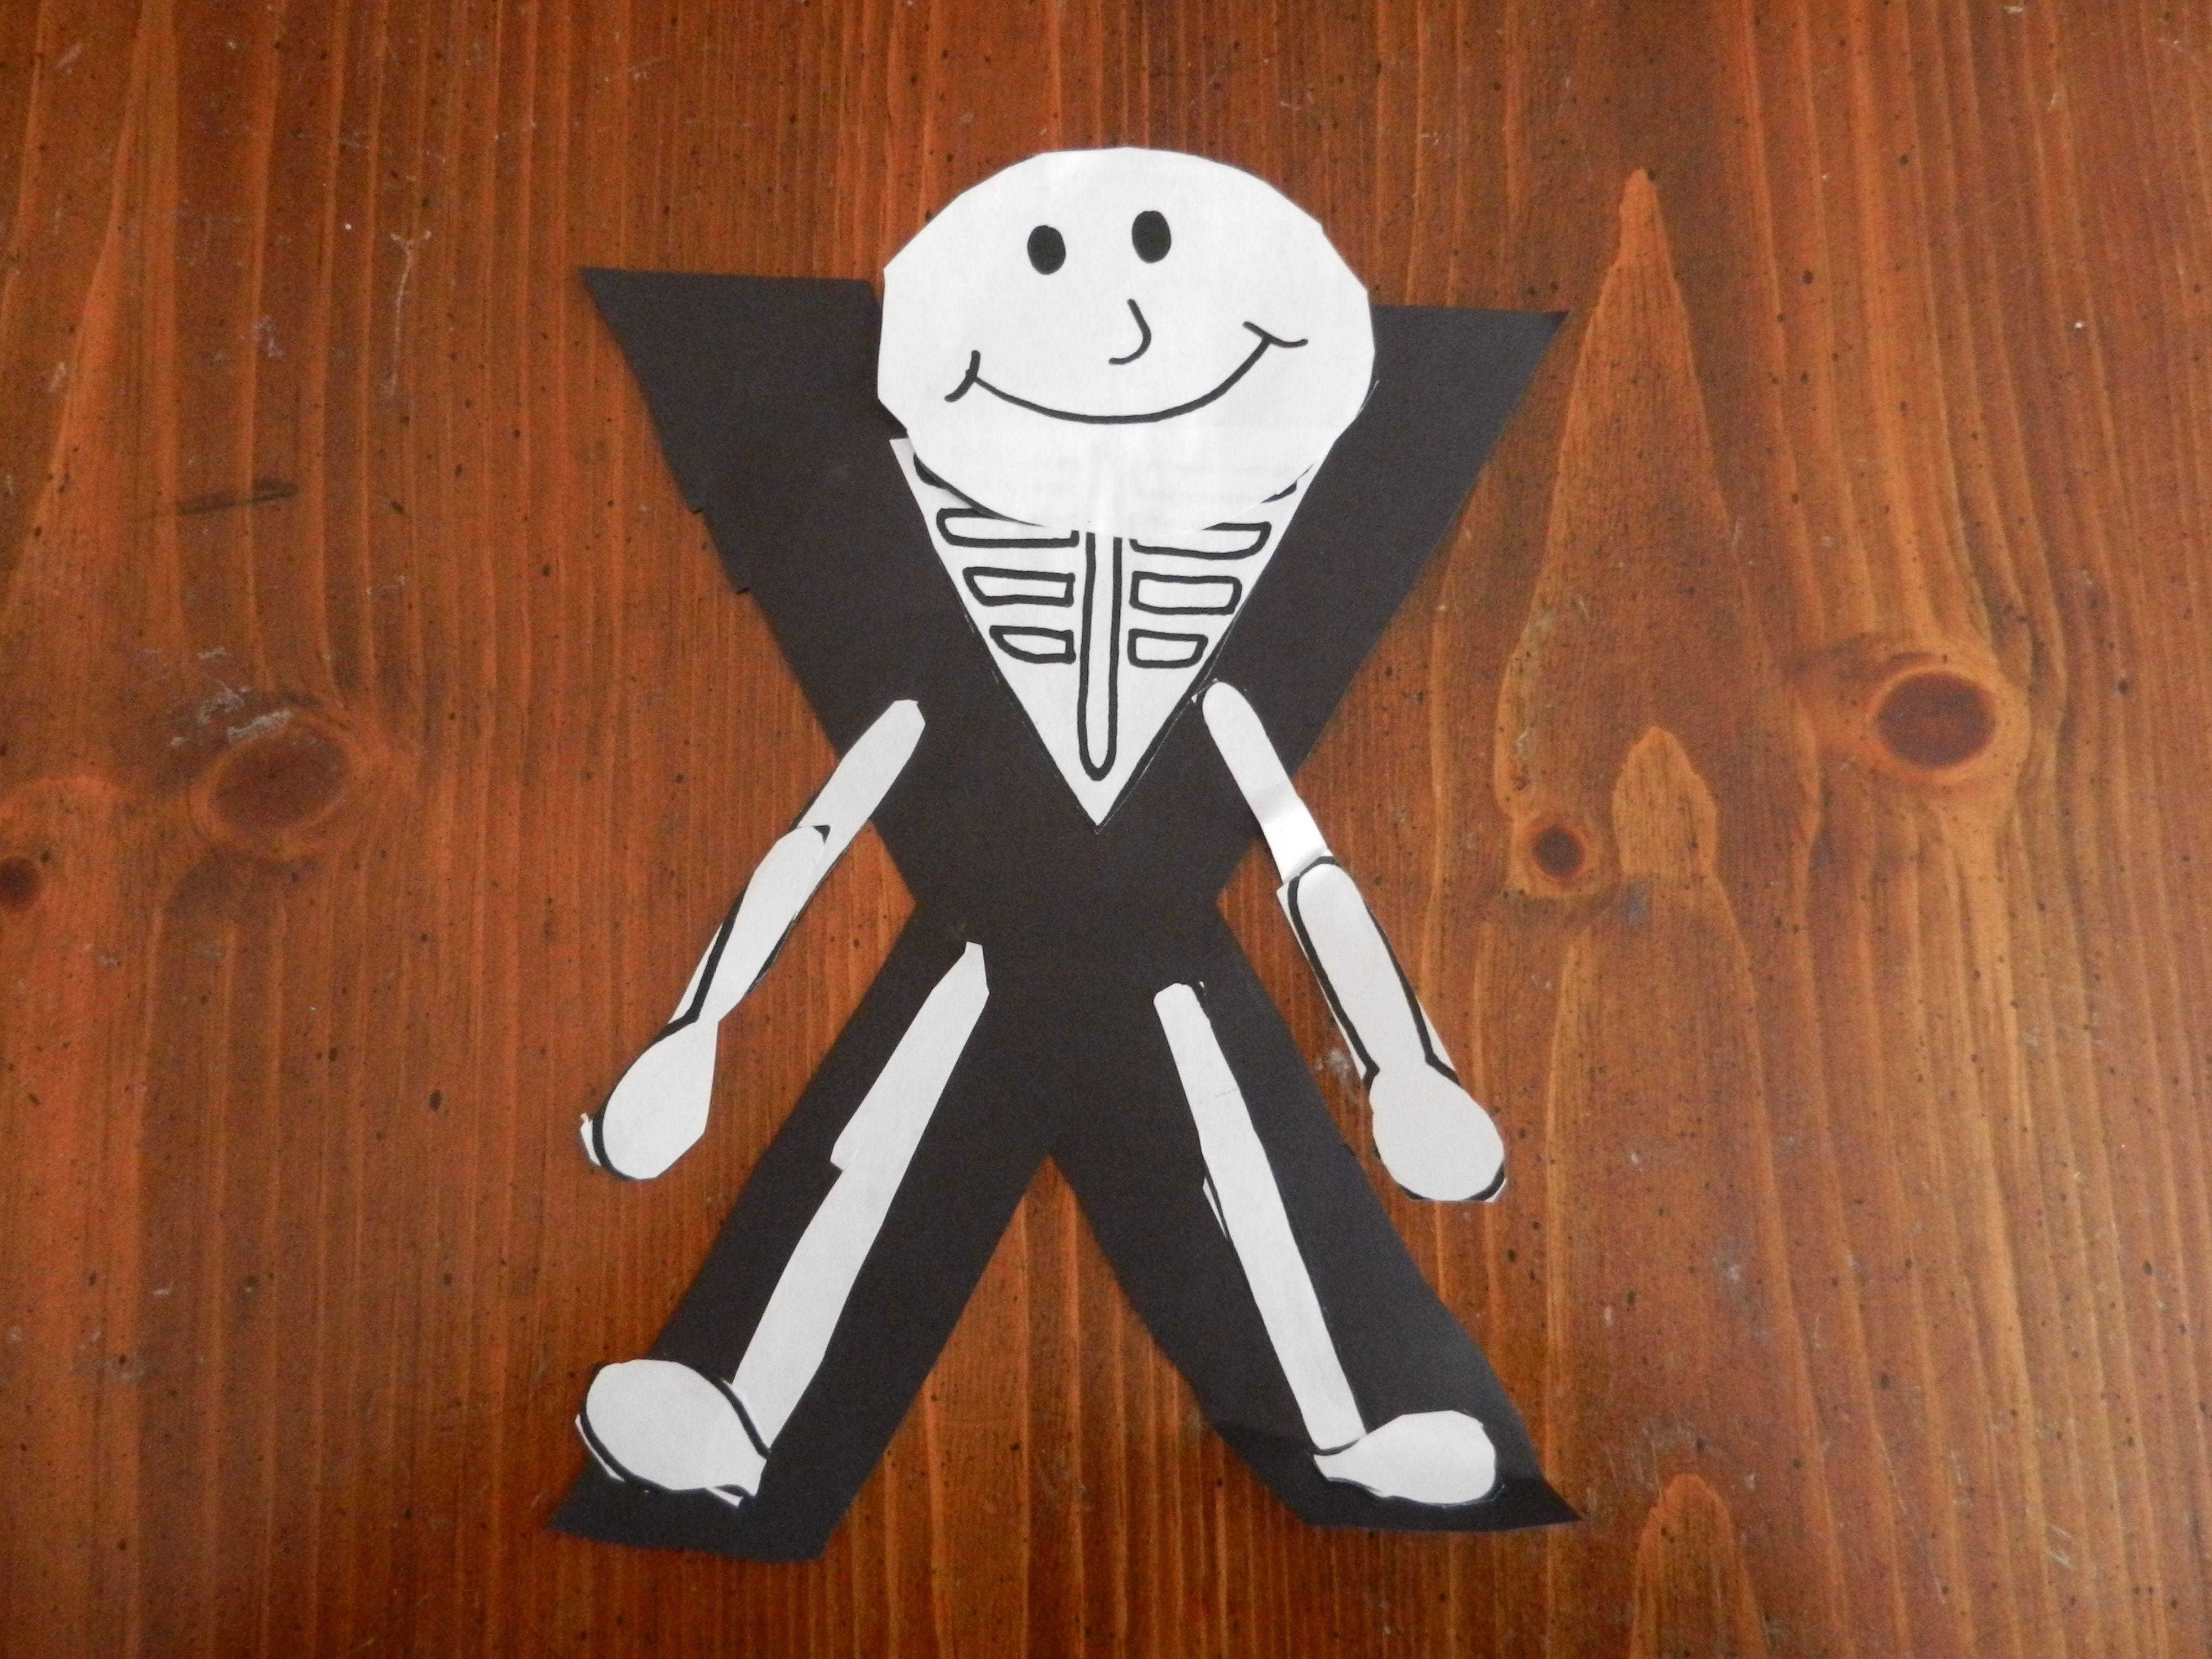 Preschool Crafts Alphabet Crafts Make An X Ray For Letter X Craft